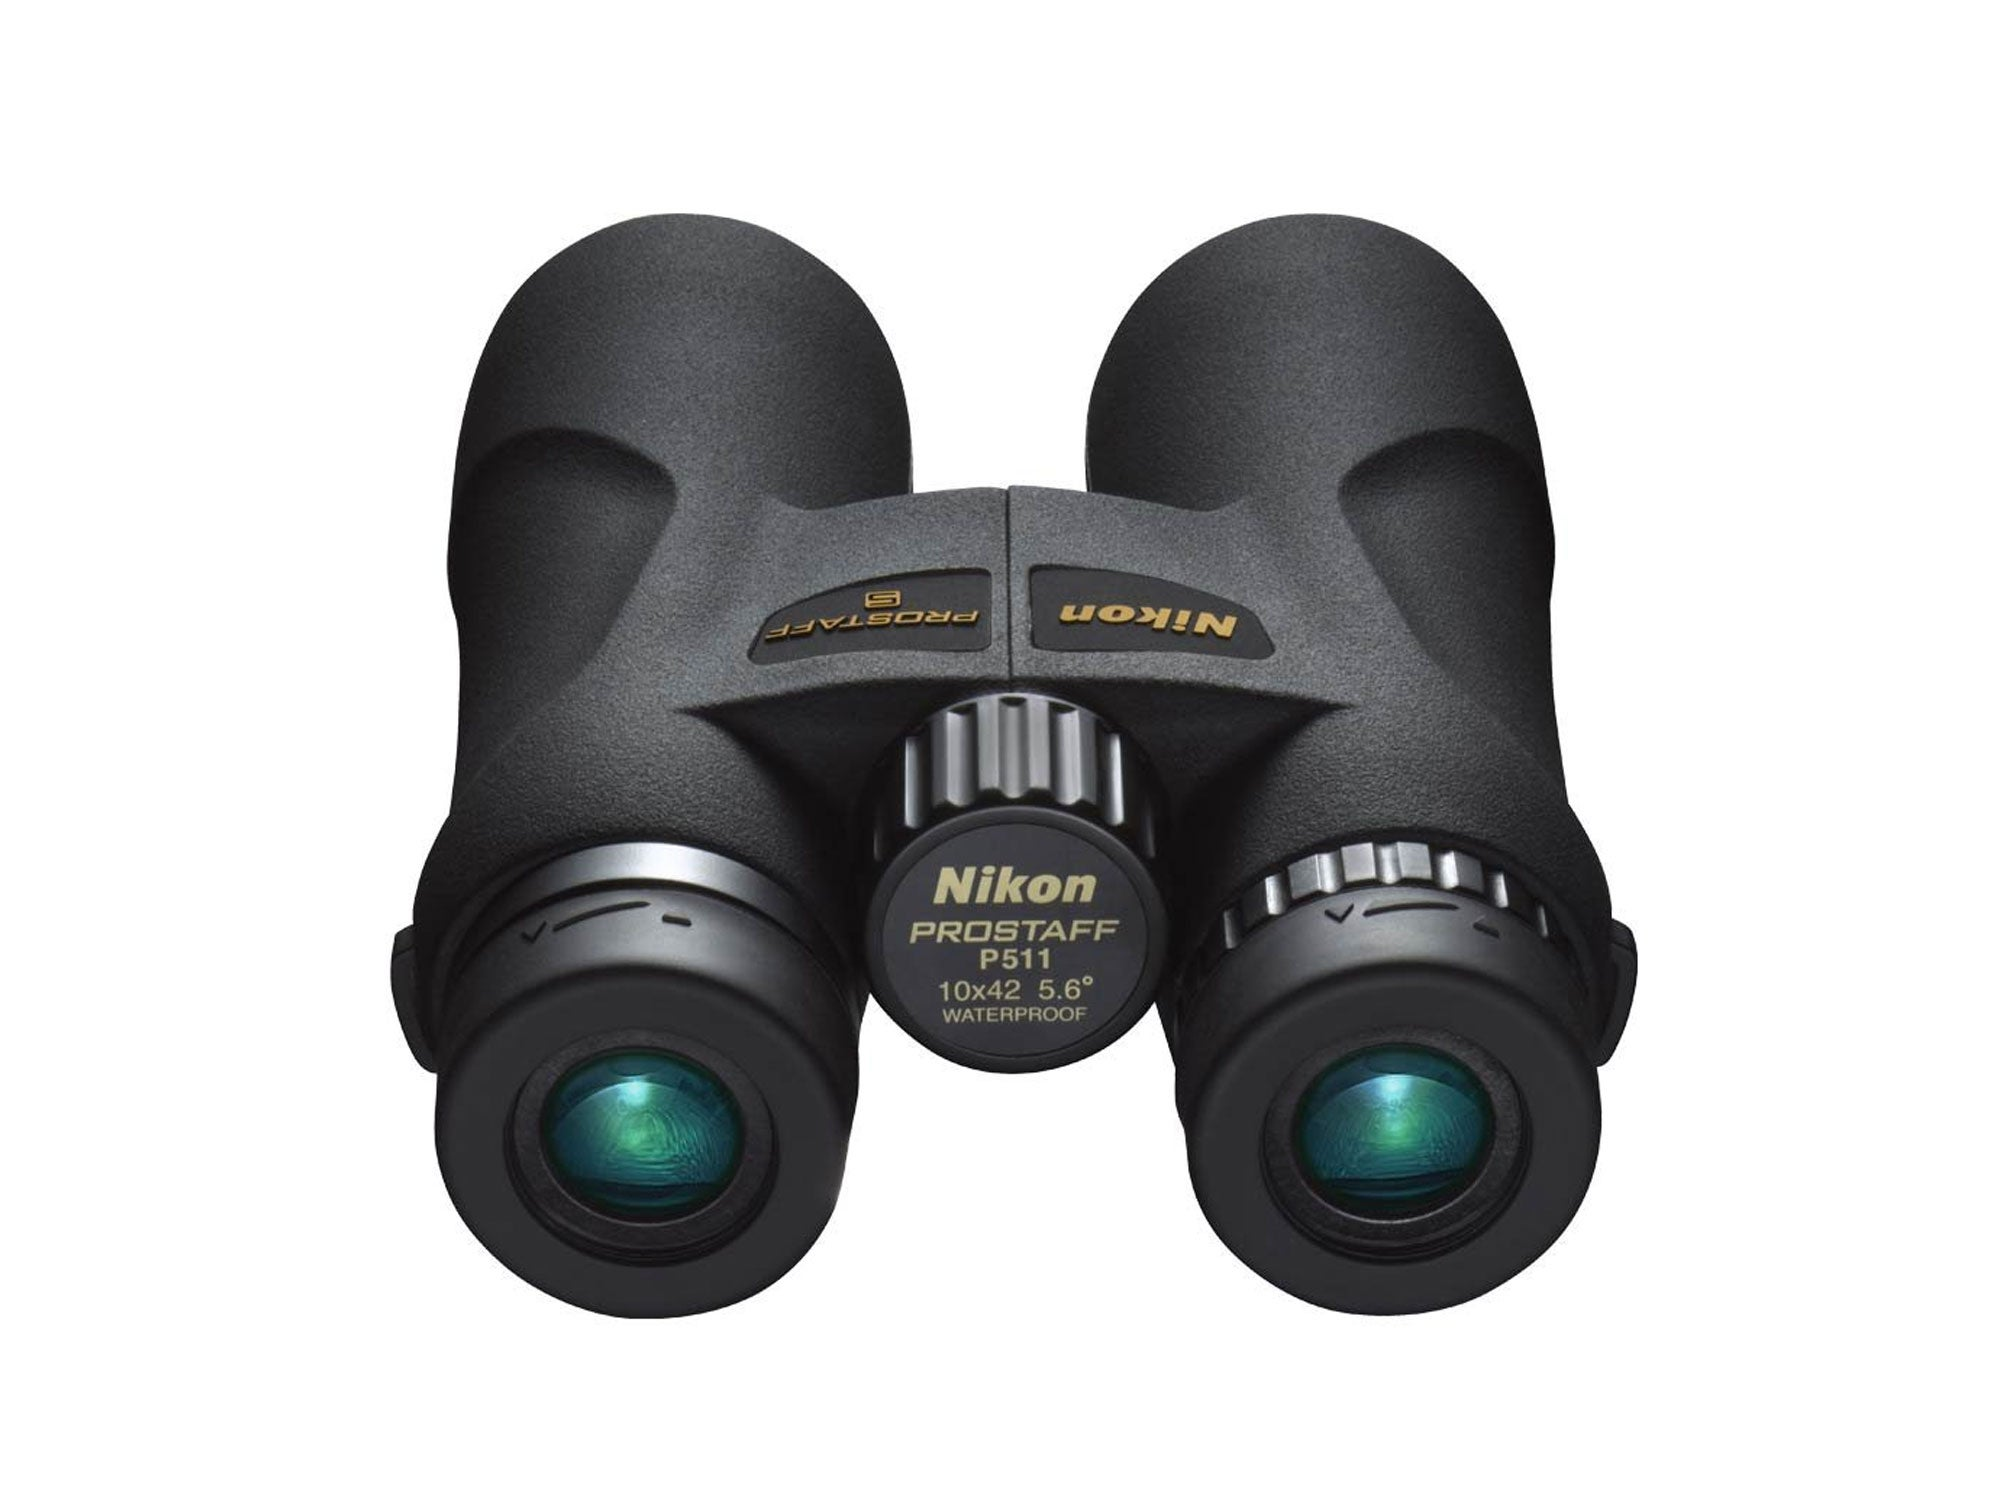 Nikon Prostaff binoculars